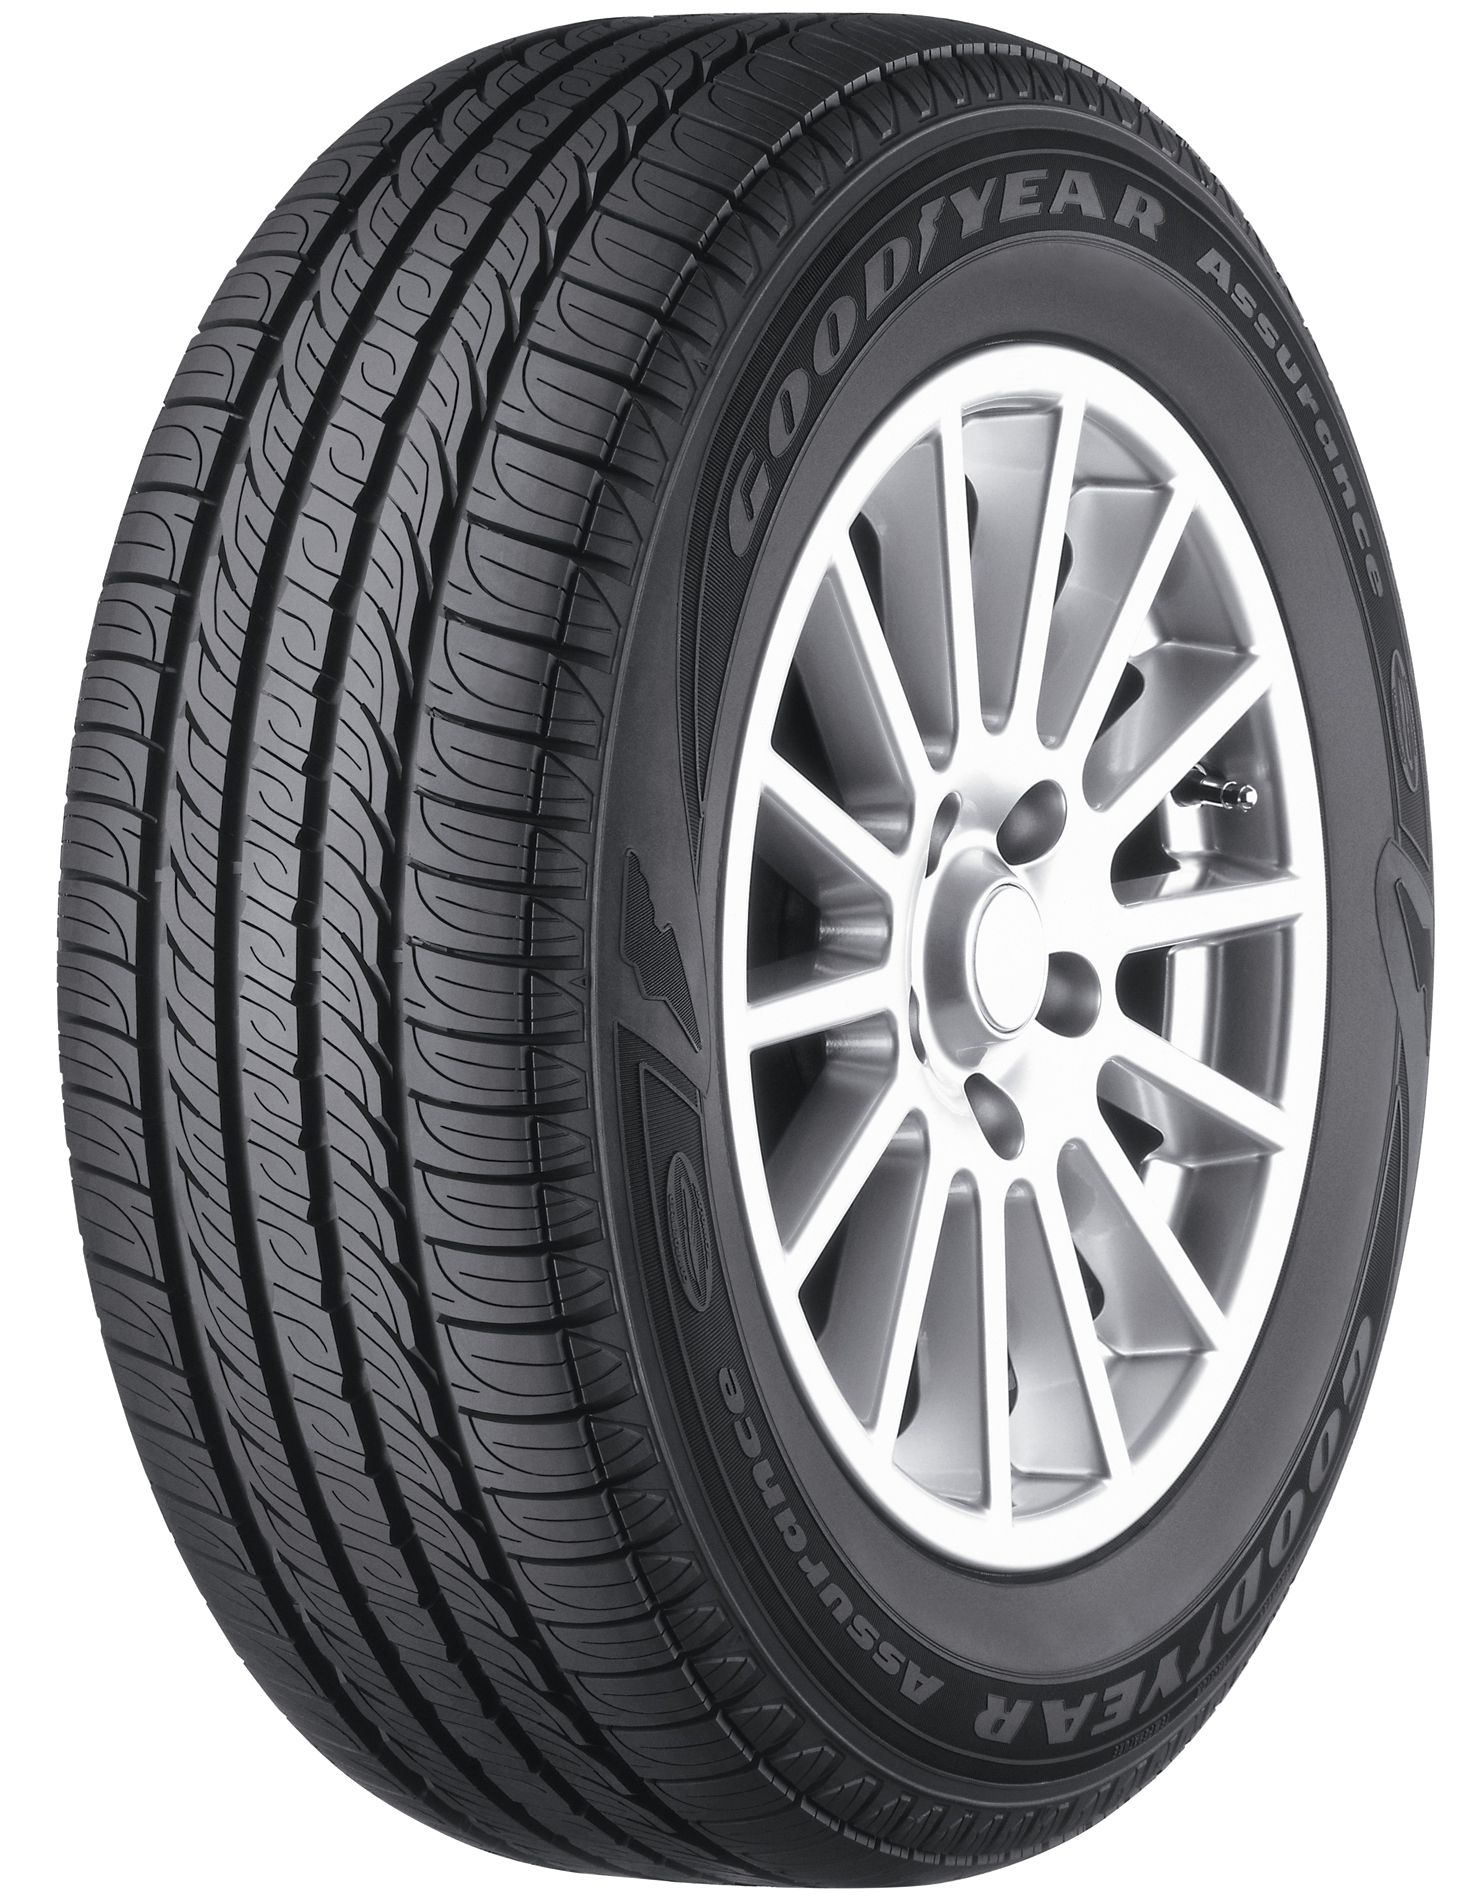 Goodyear Assurance Comfortred P225 60r18 99h All Season Tire